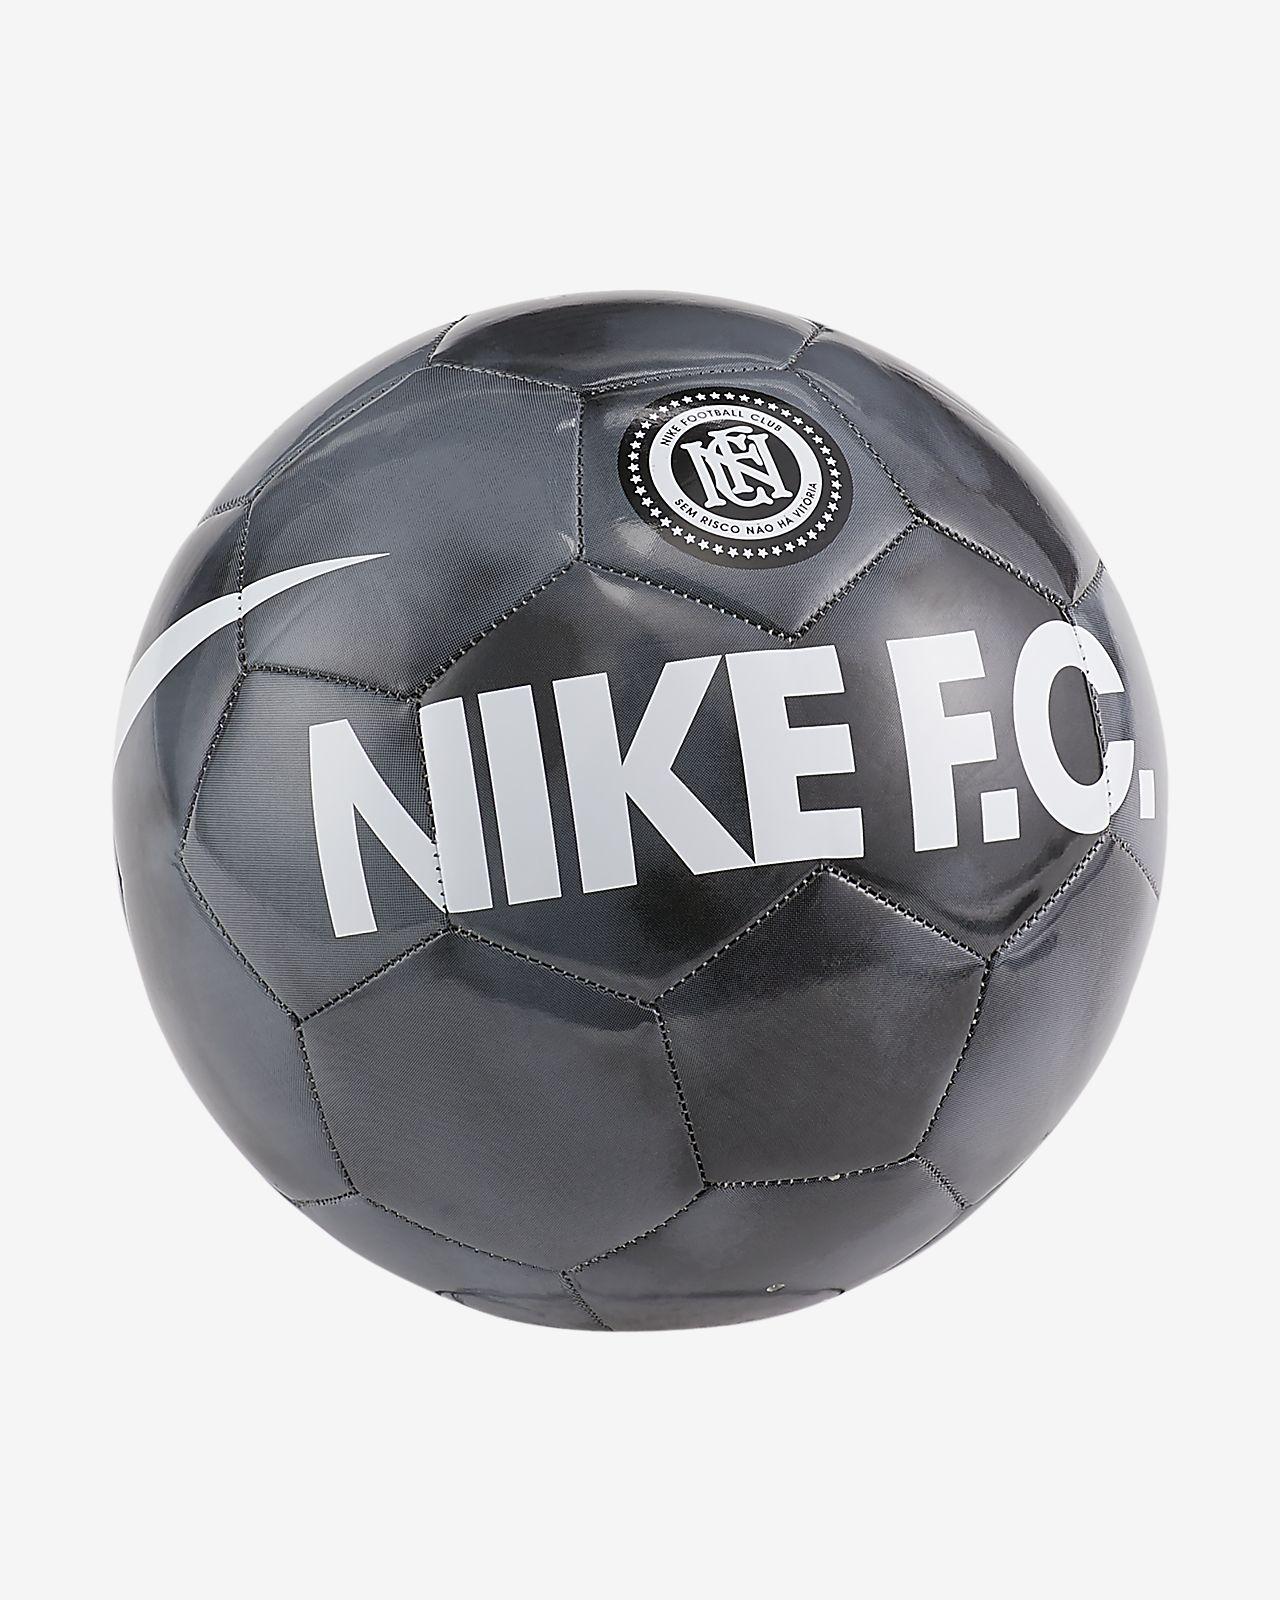 Nike F C Fussball